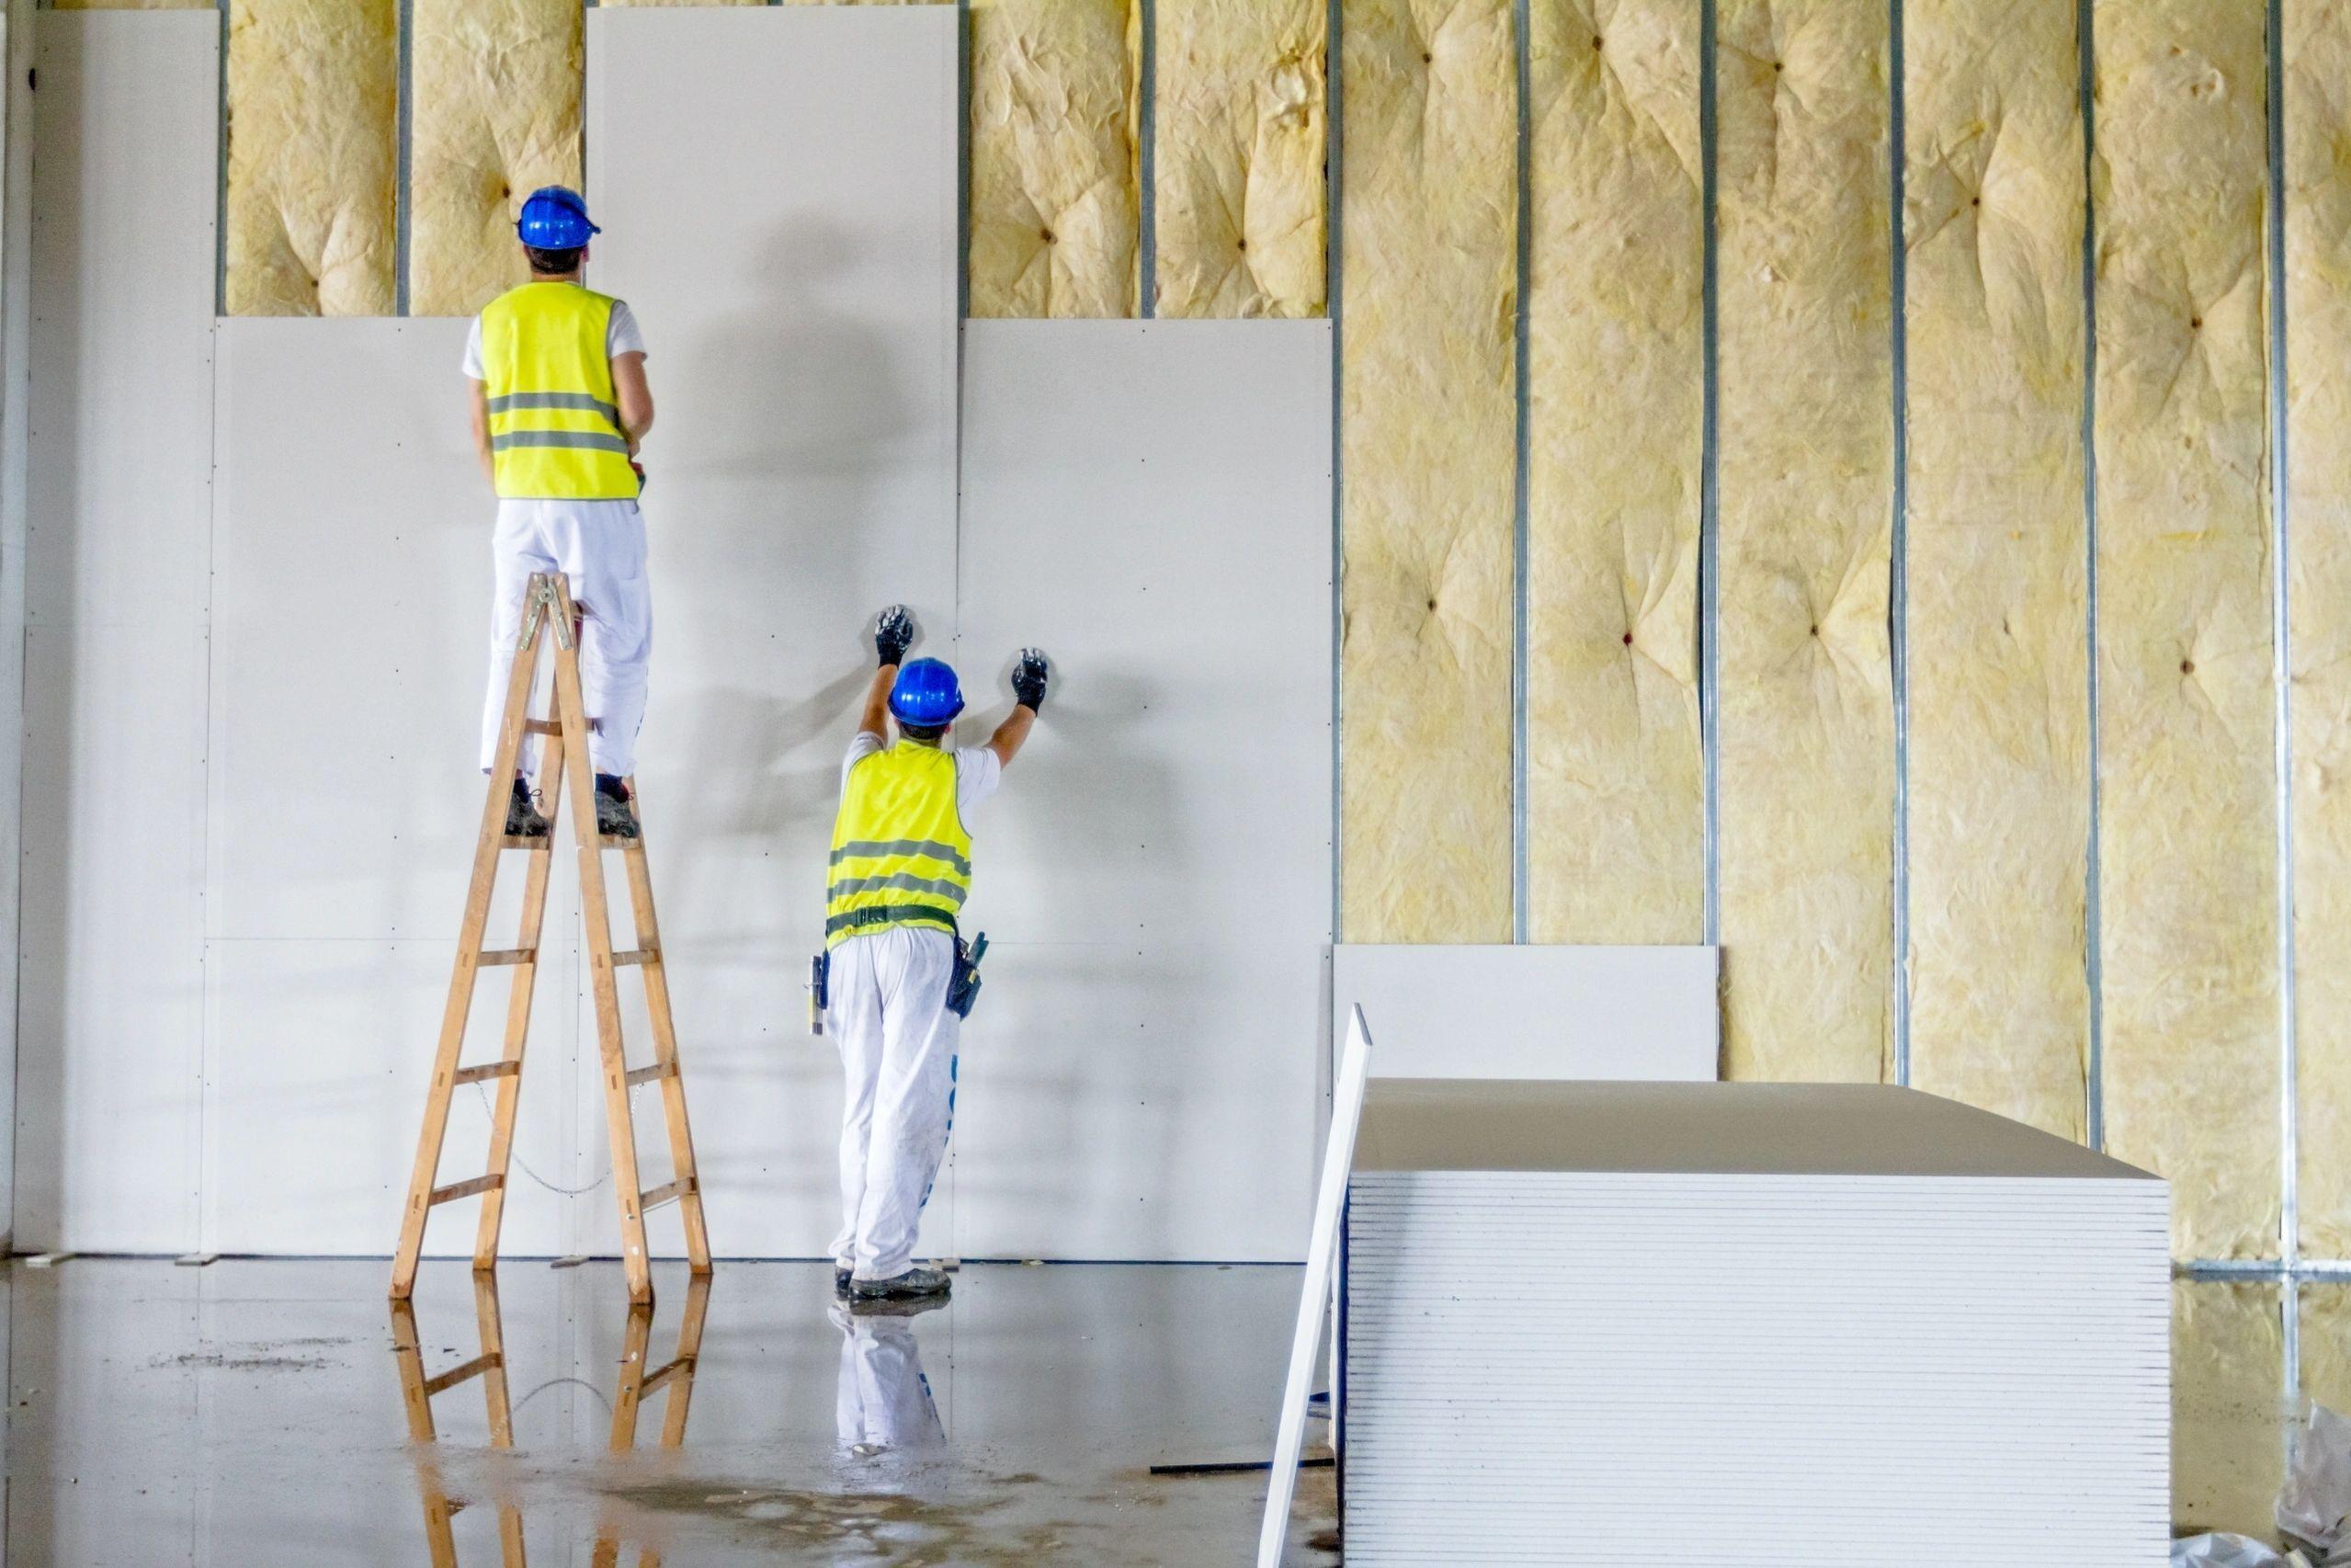 EC8 - Digitizing the Building Industry